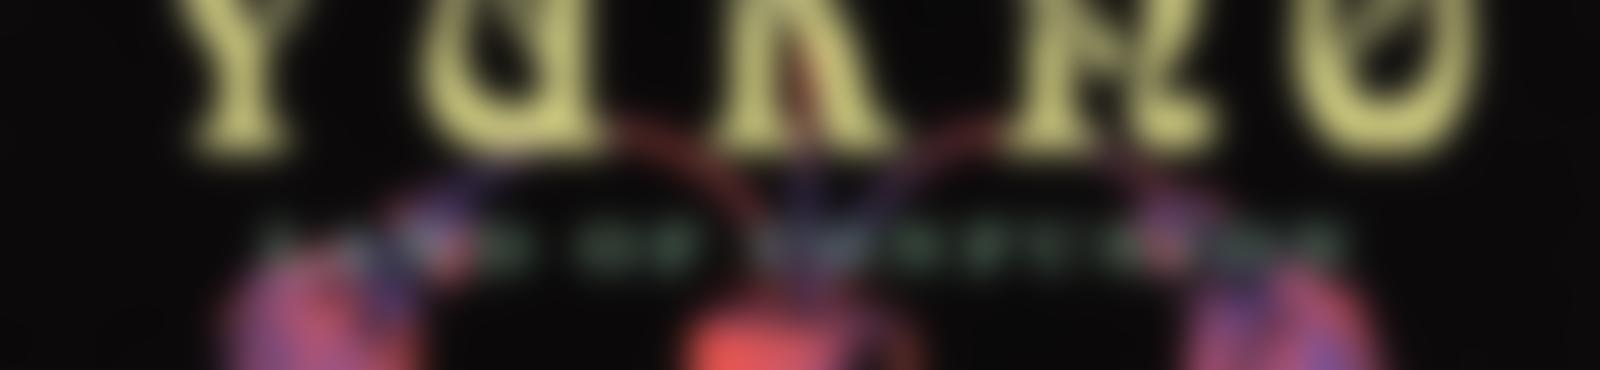 Blurred 83900eab 6fca 4908 bd23 e4a79862af1d